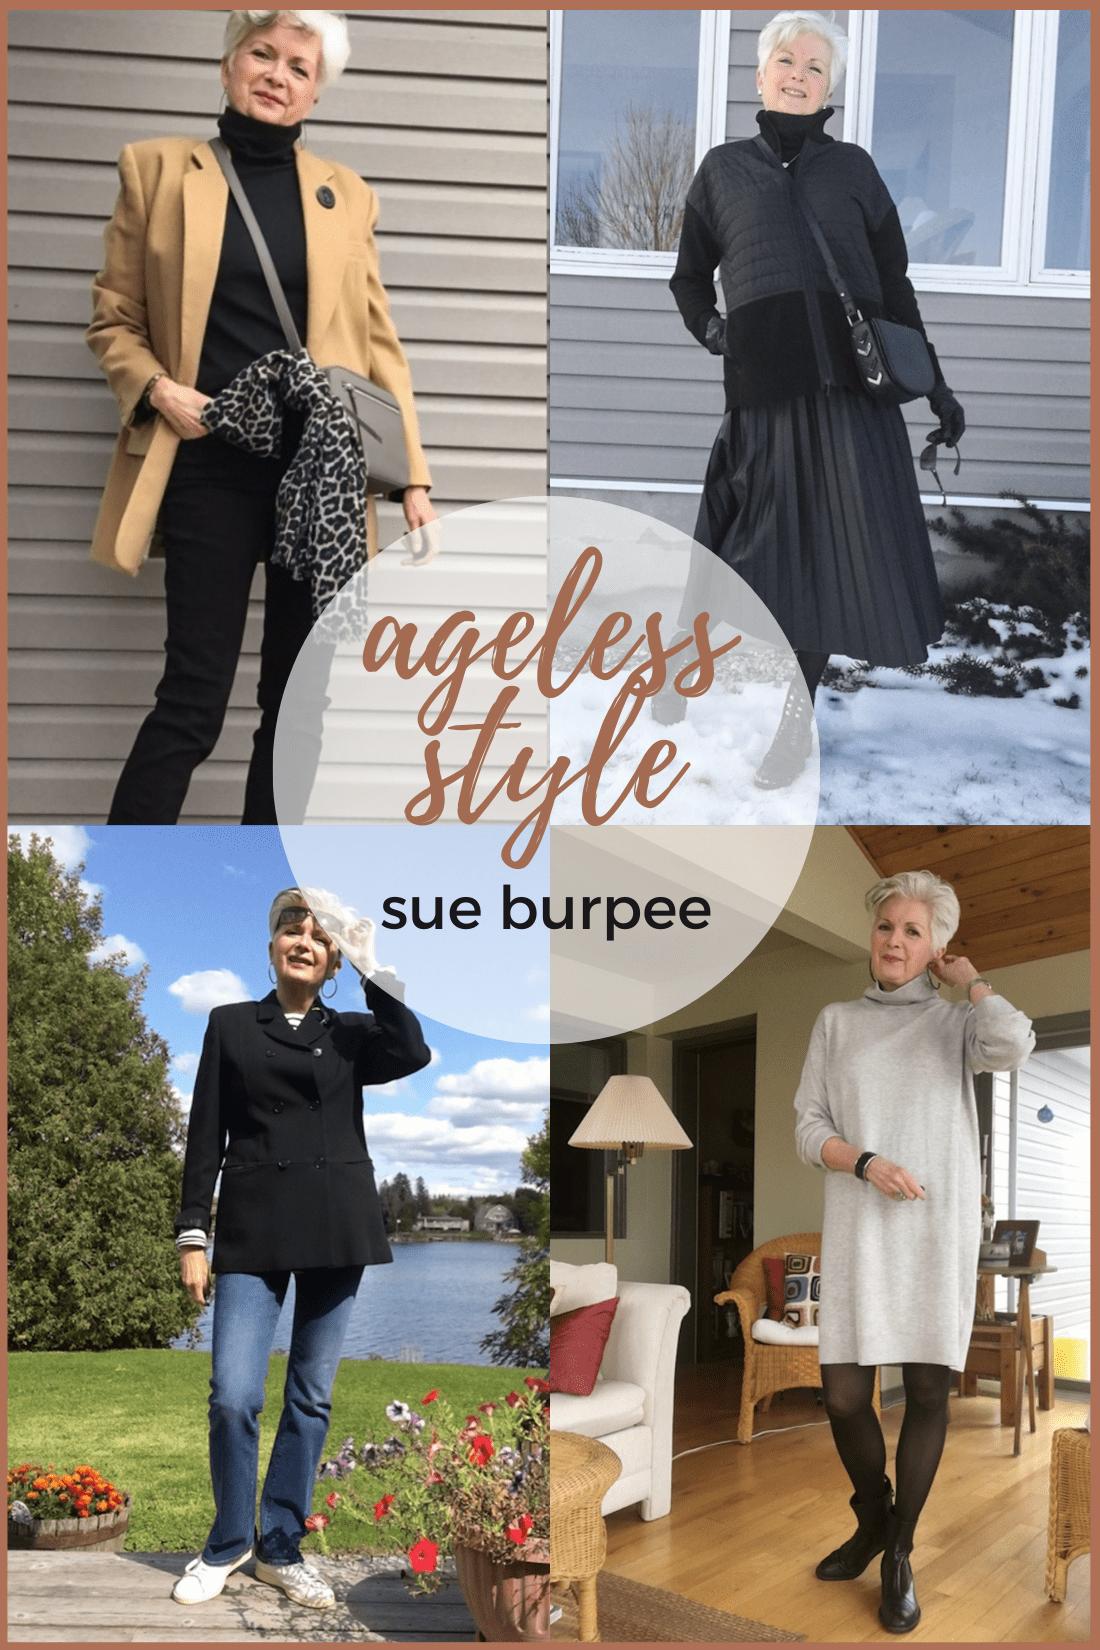 ageless style sue burpee